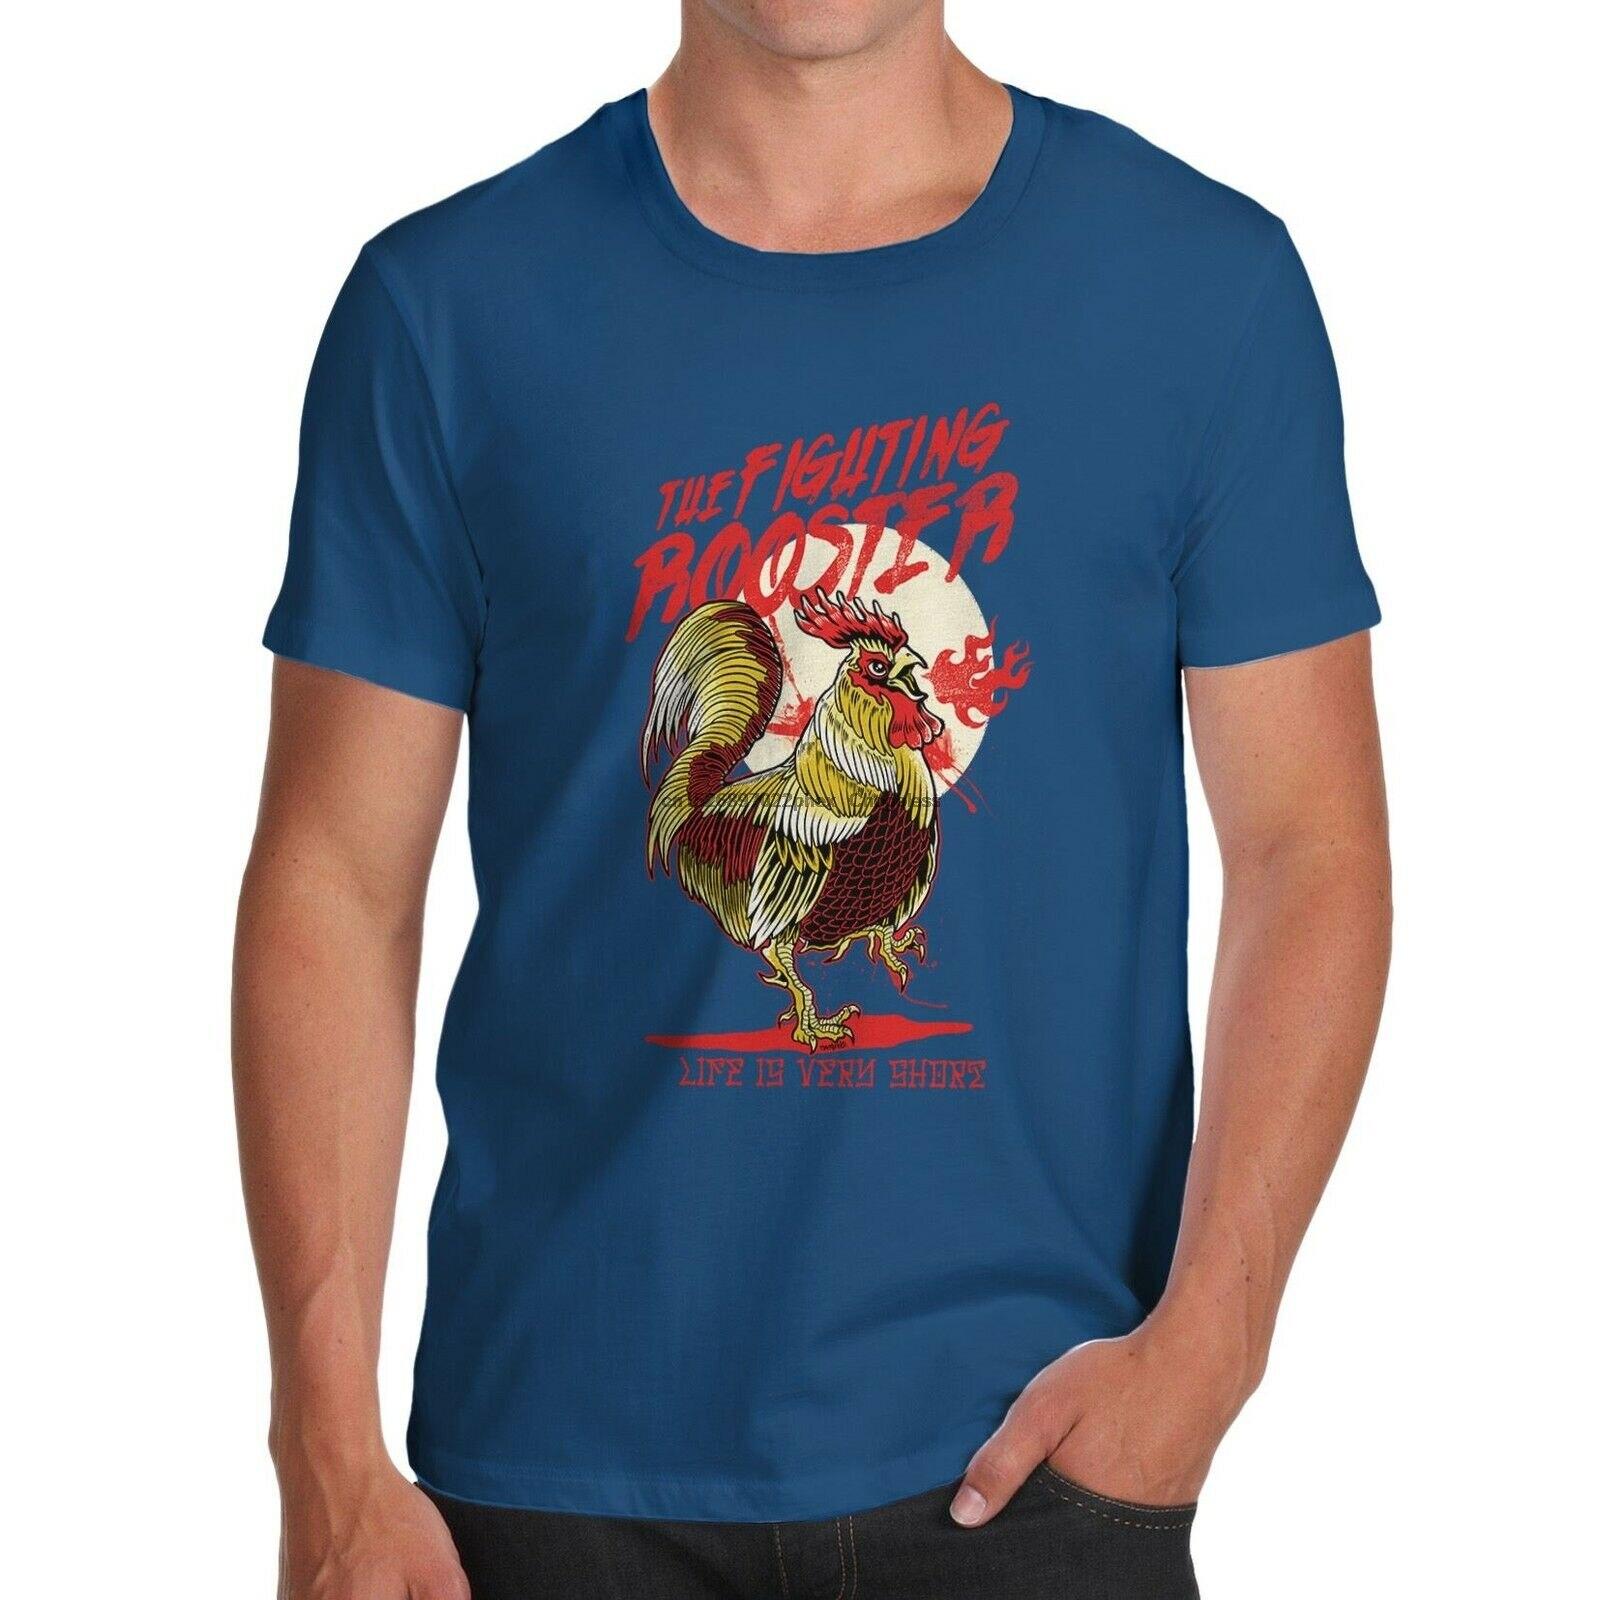 Camiseta de slogan curto de vida de galo de algodão premium masculino